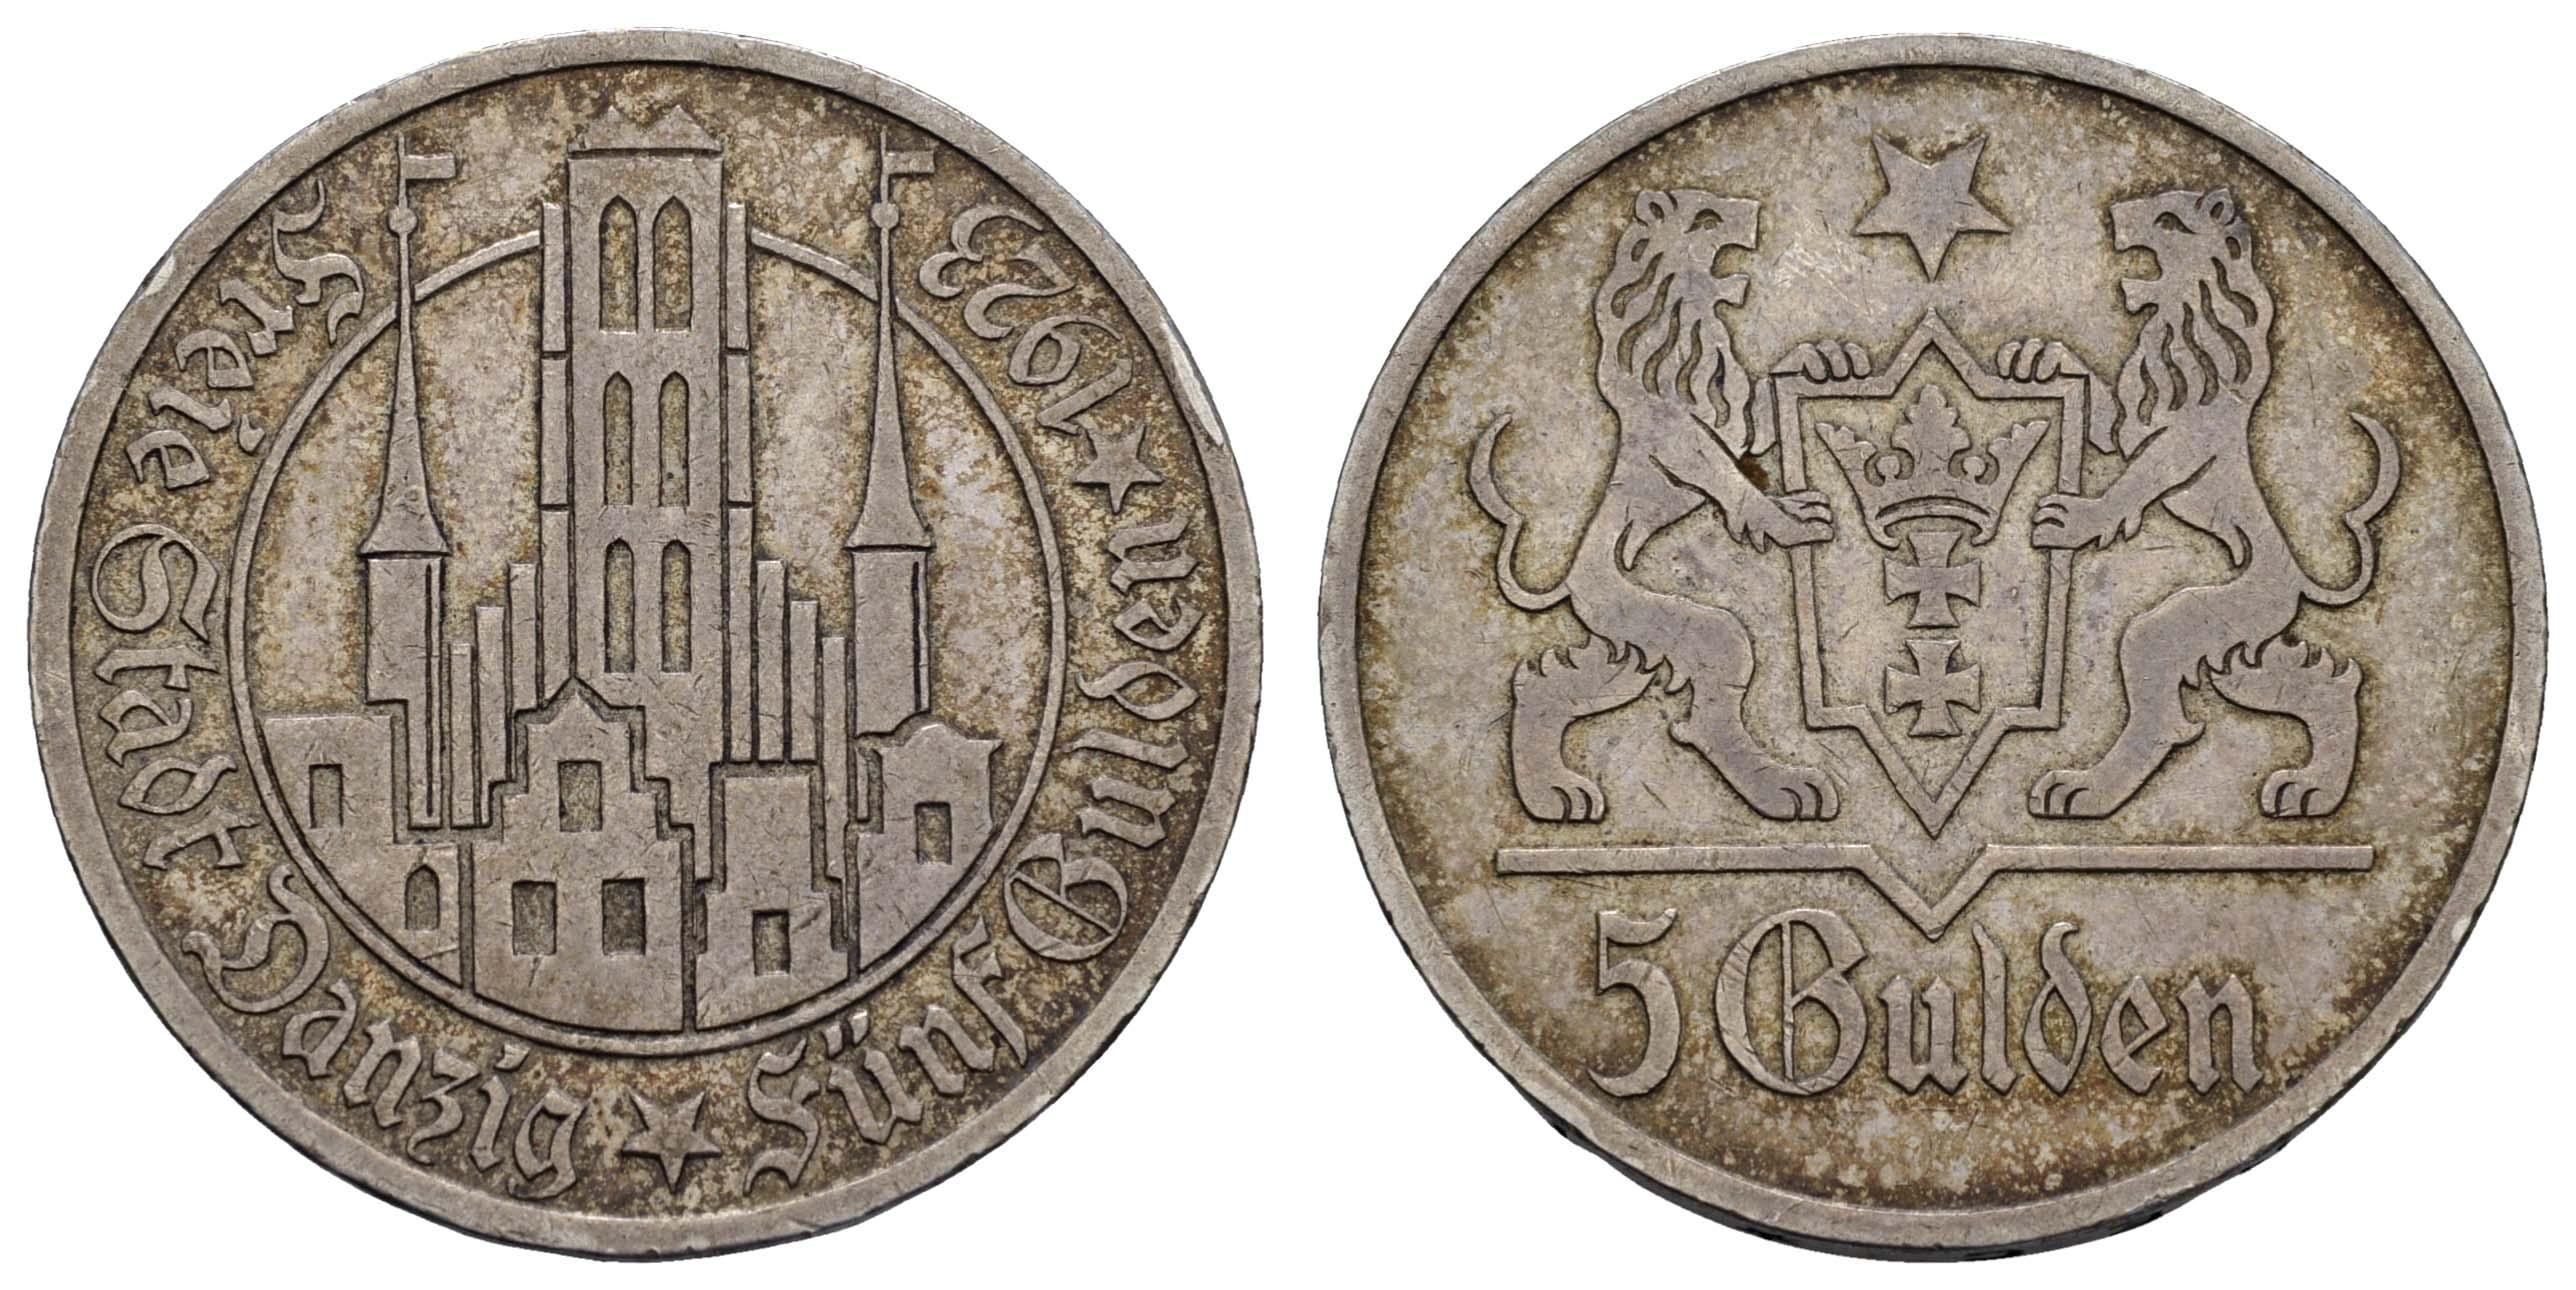 Lot 1101 - deutschland Nebengebiete - Danzig -  Auktionshaus Ulrich Felzmann GmbH & Co. KG Coins single lots